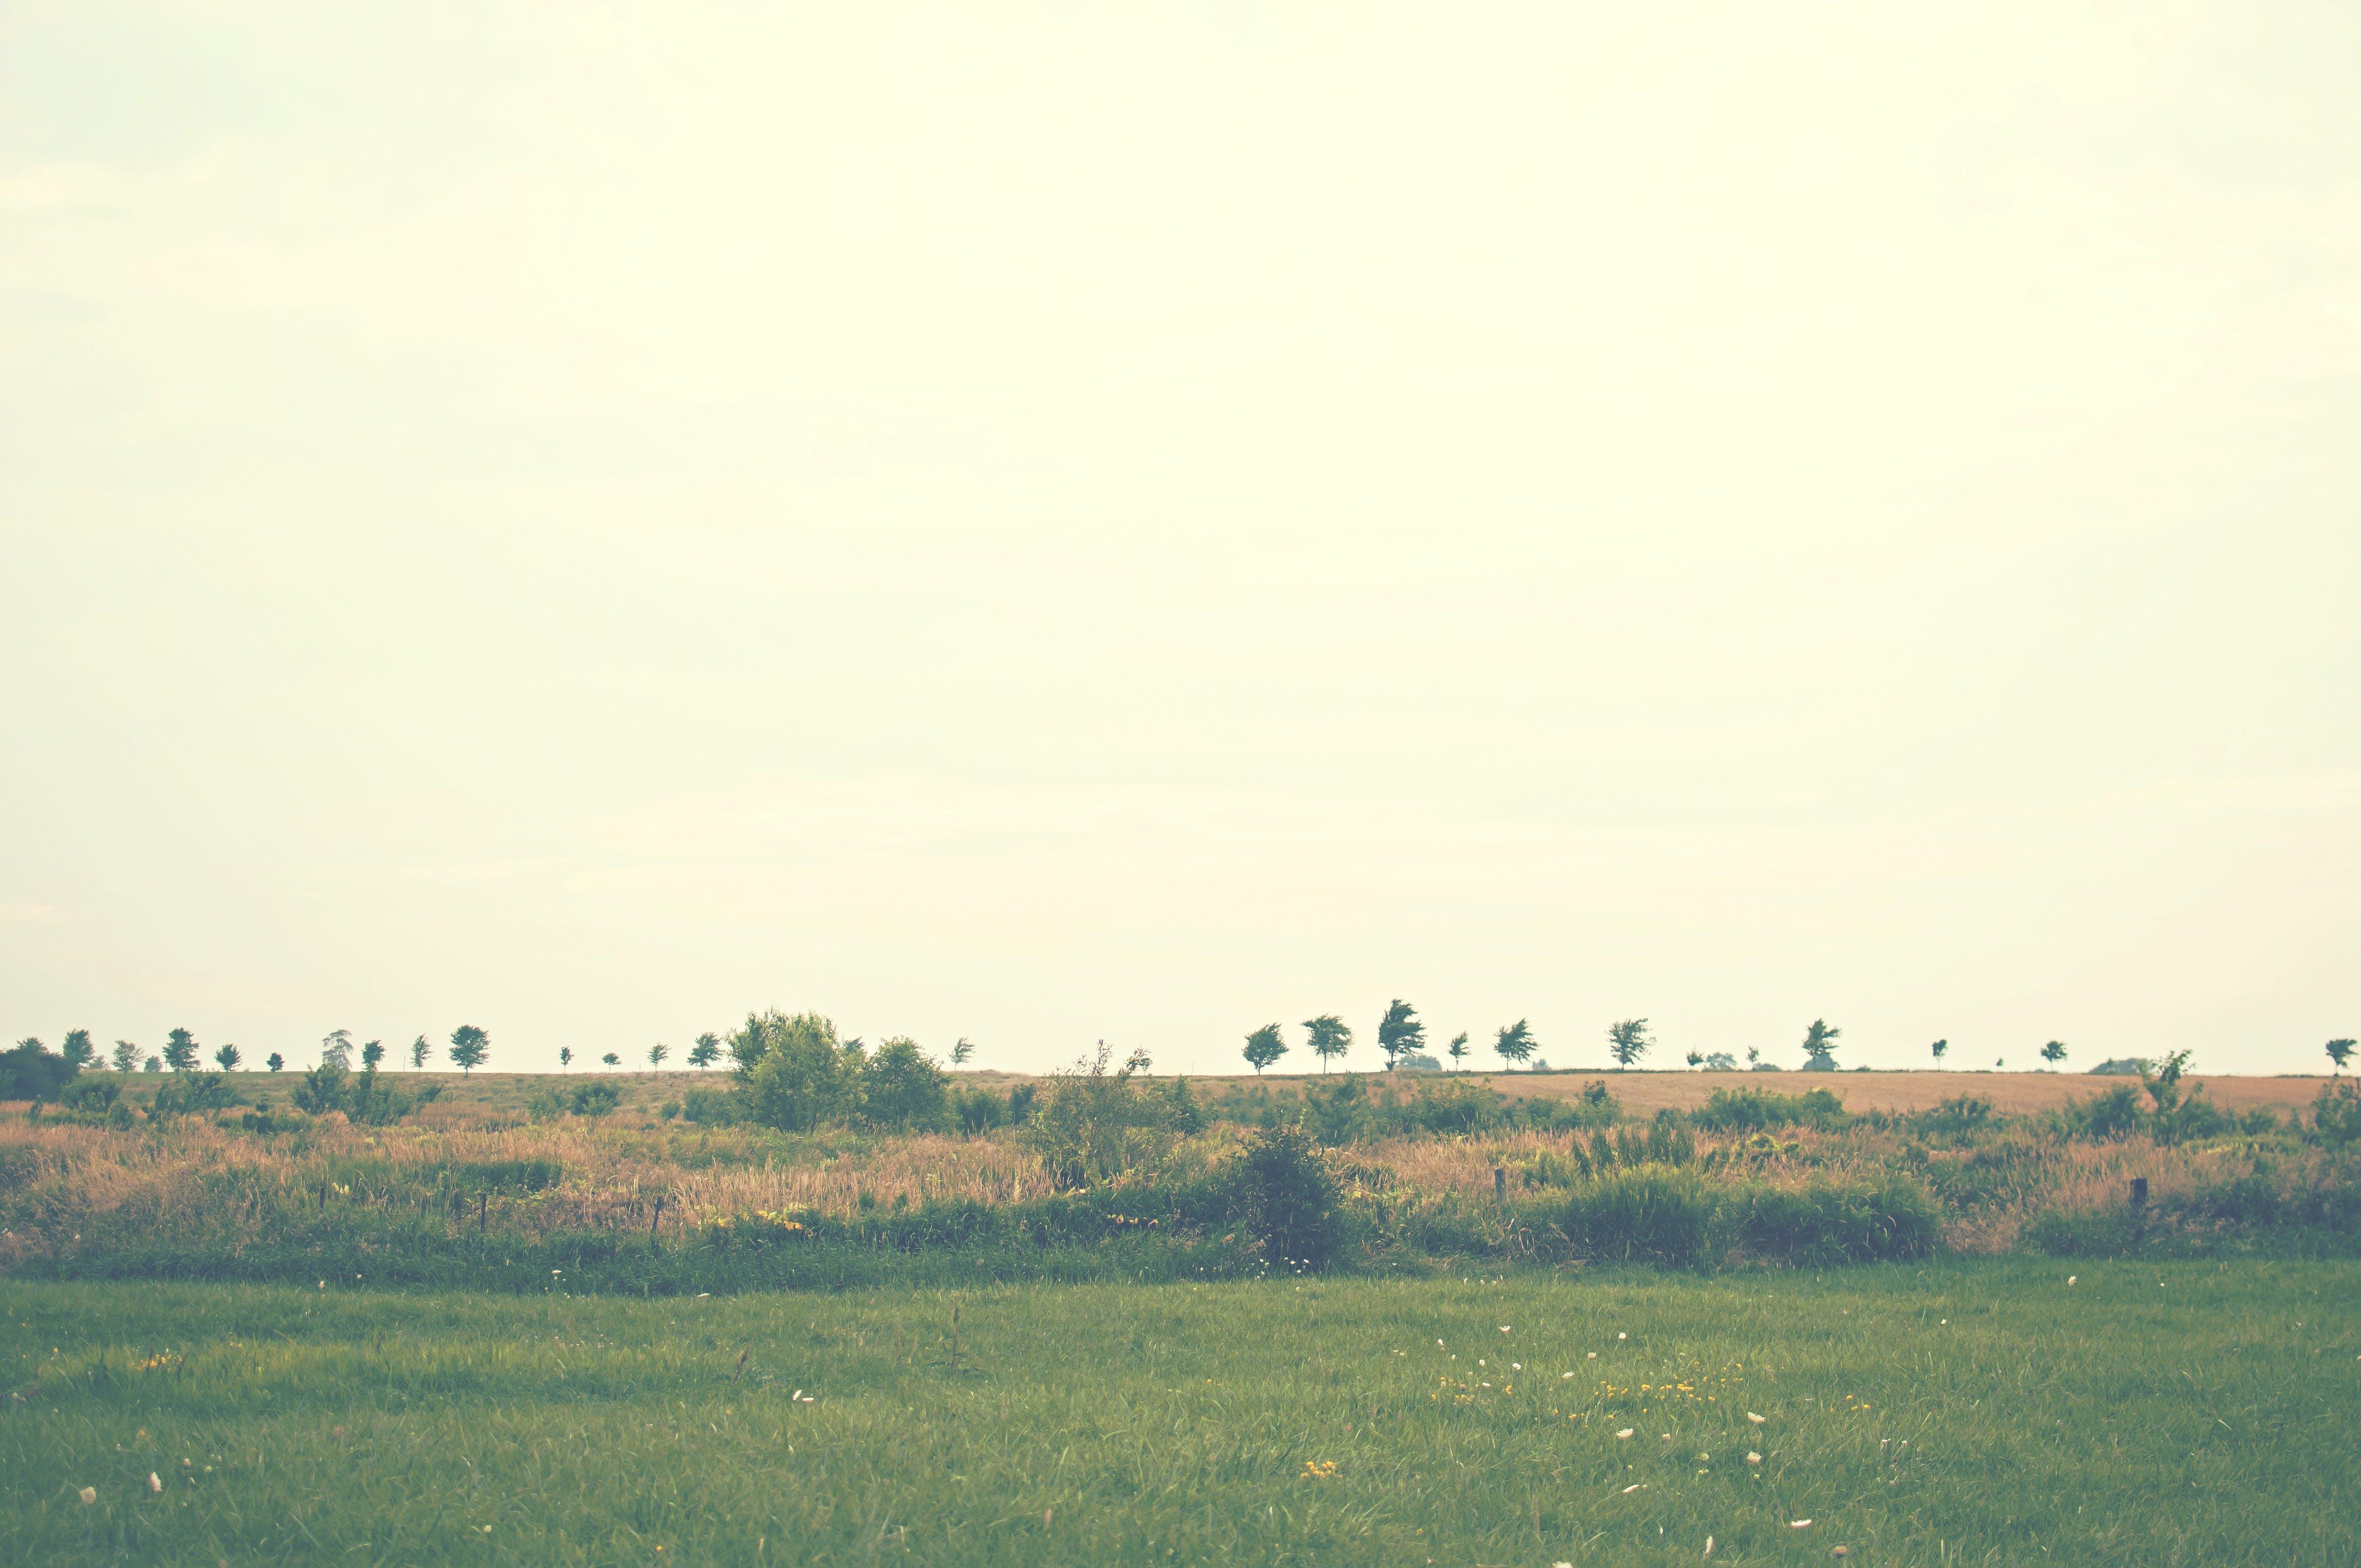 field, grass, landscape